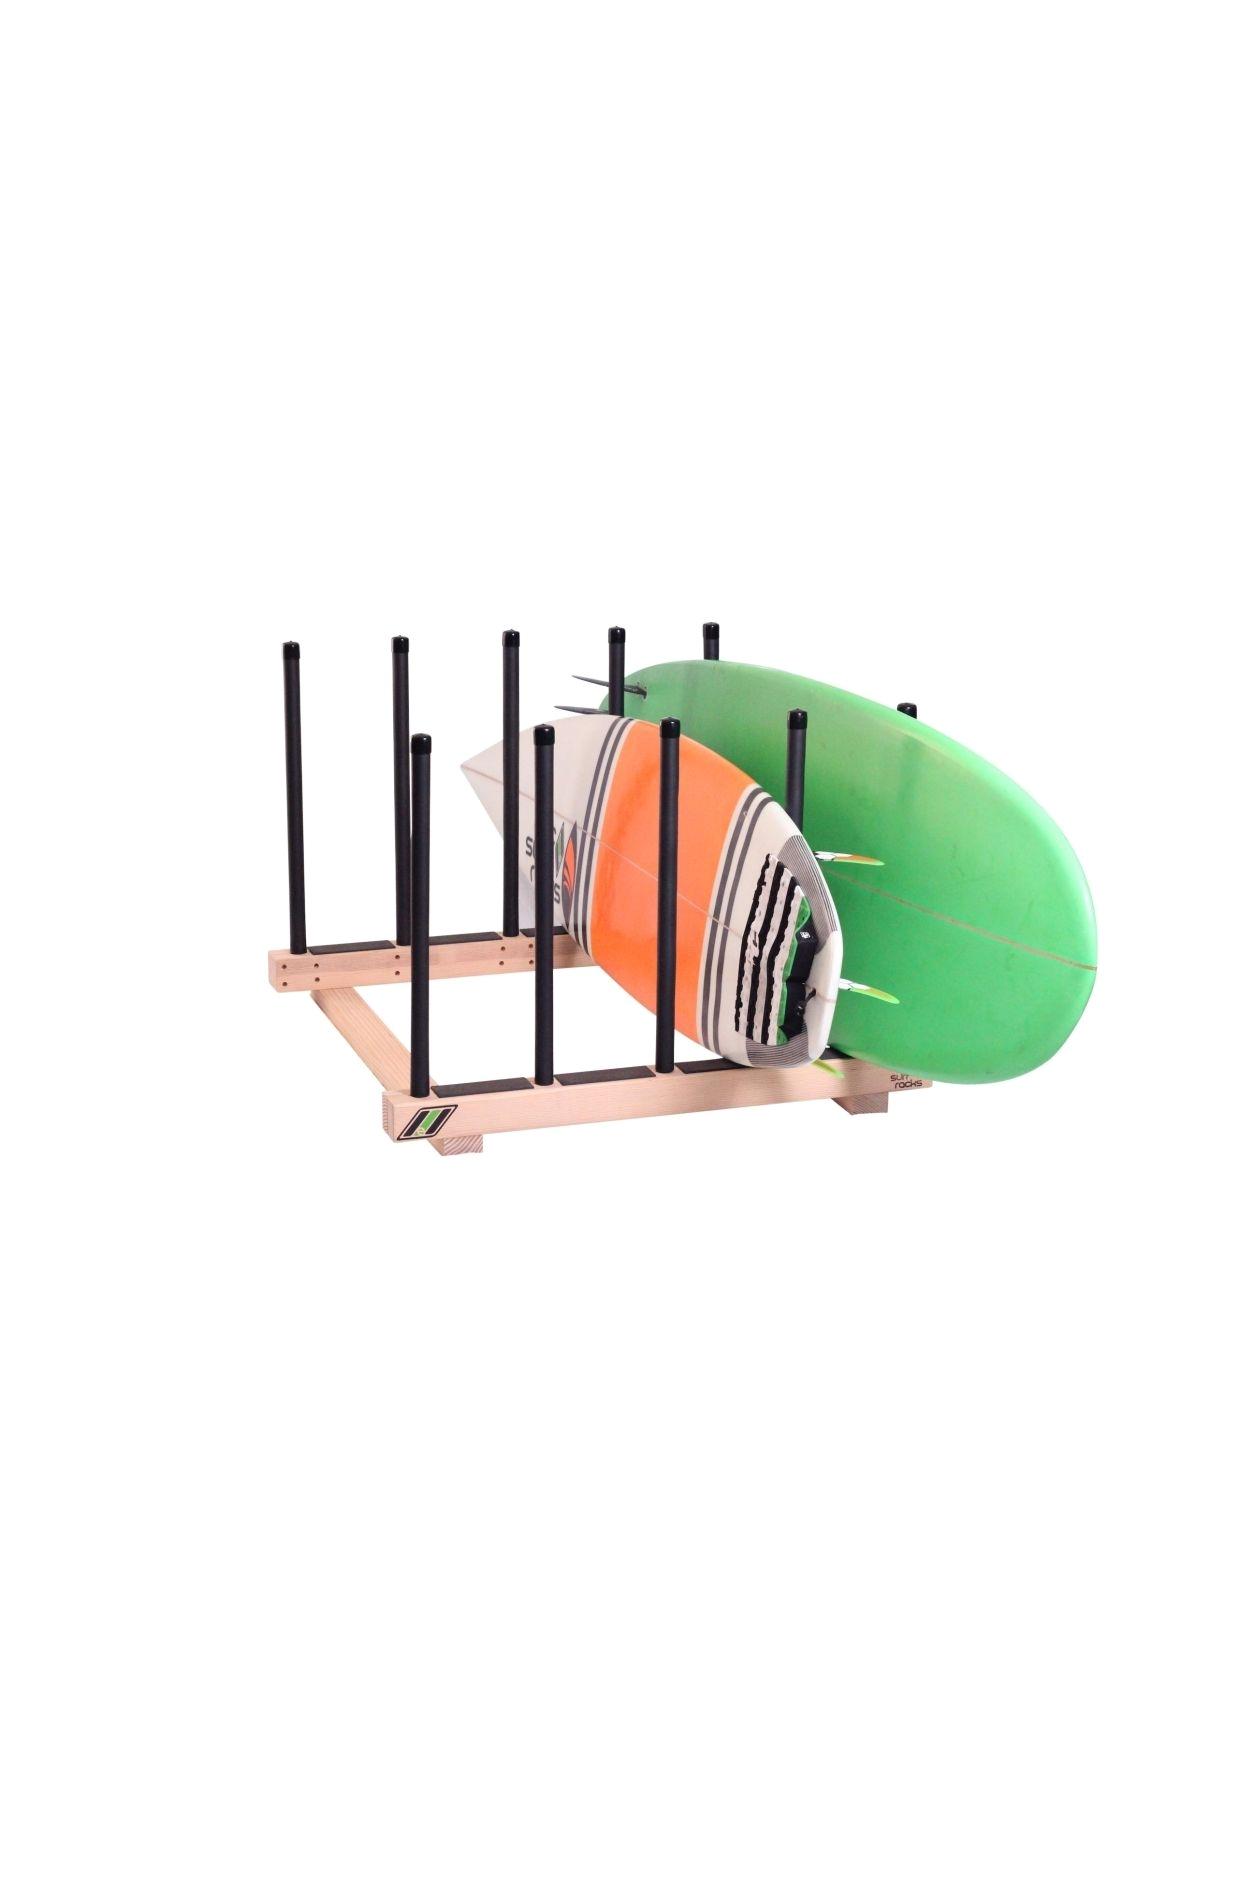 the pig dog surfboard sup floor rack